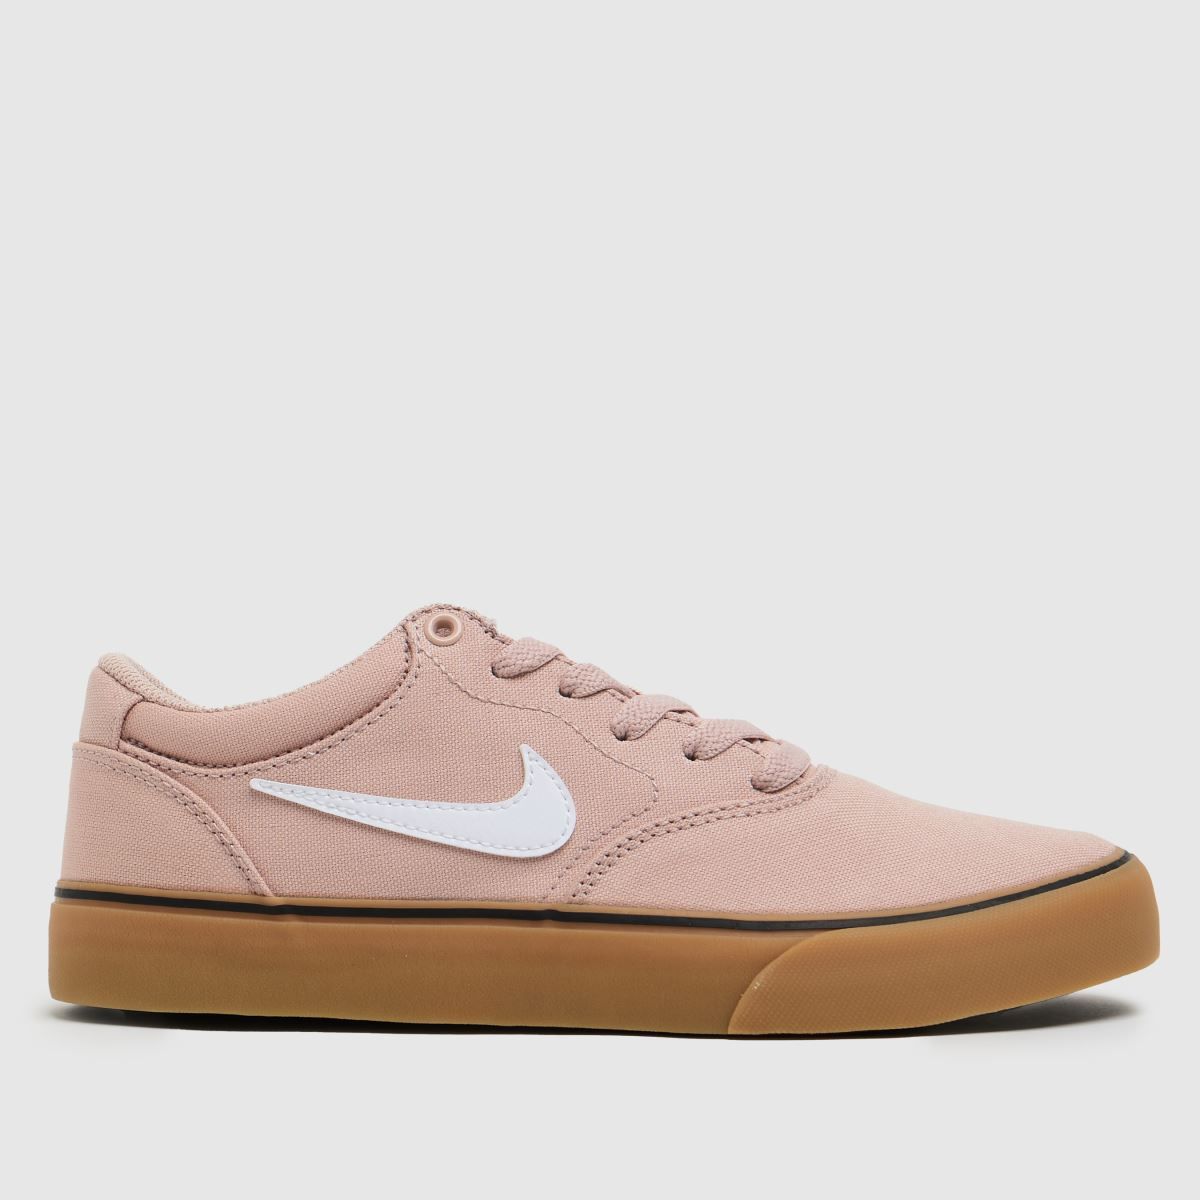 Nike SB Pale Pink Chron 2 Trainers